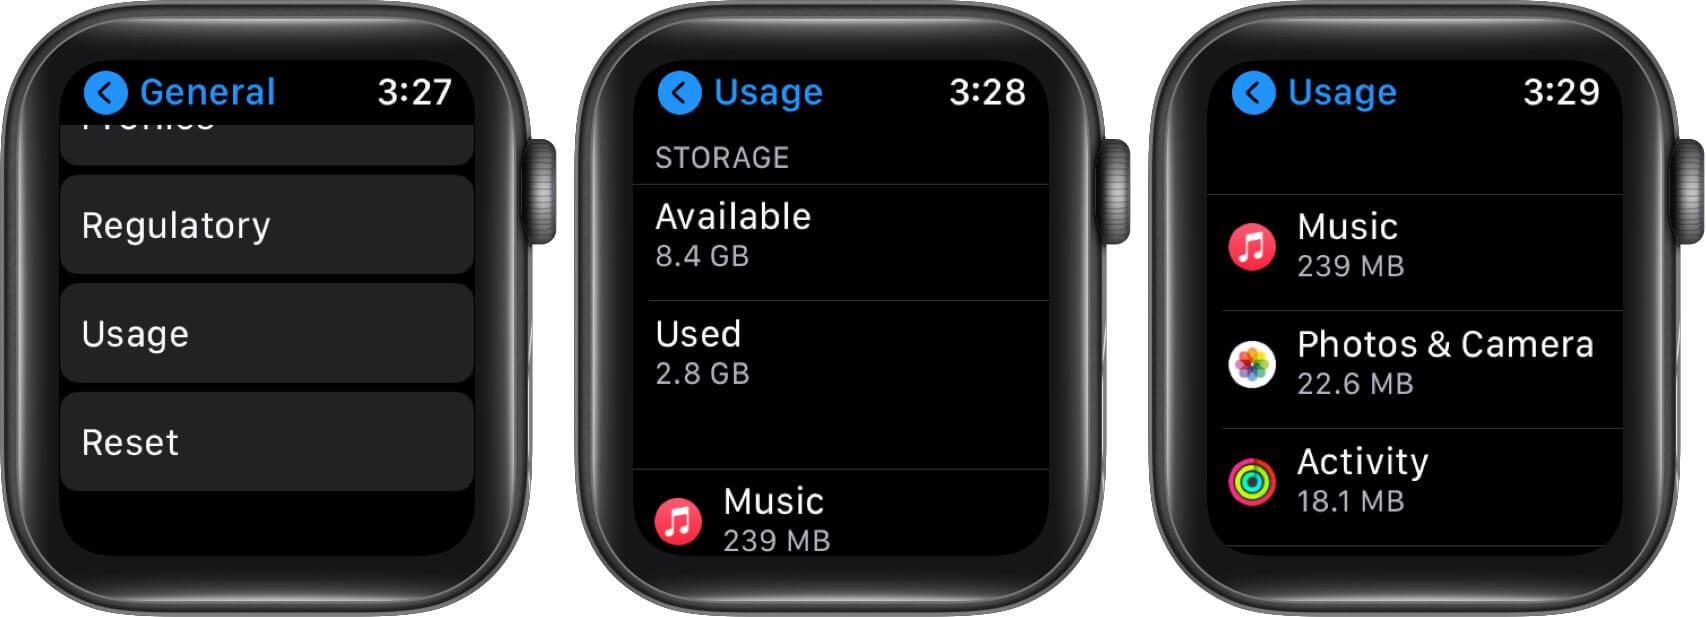 Kiểm tra bộ nhớ từ Apple Watch